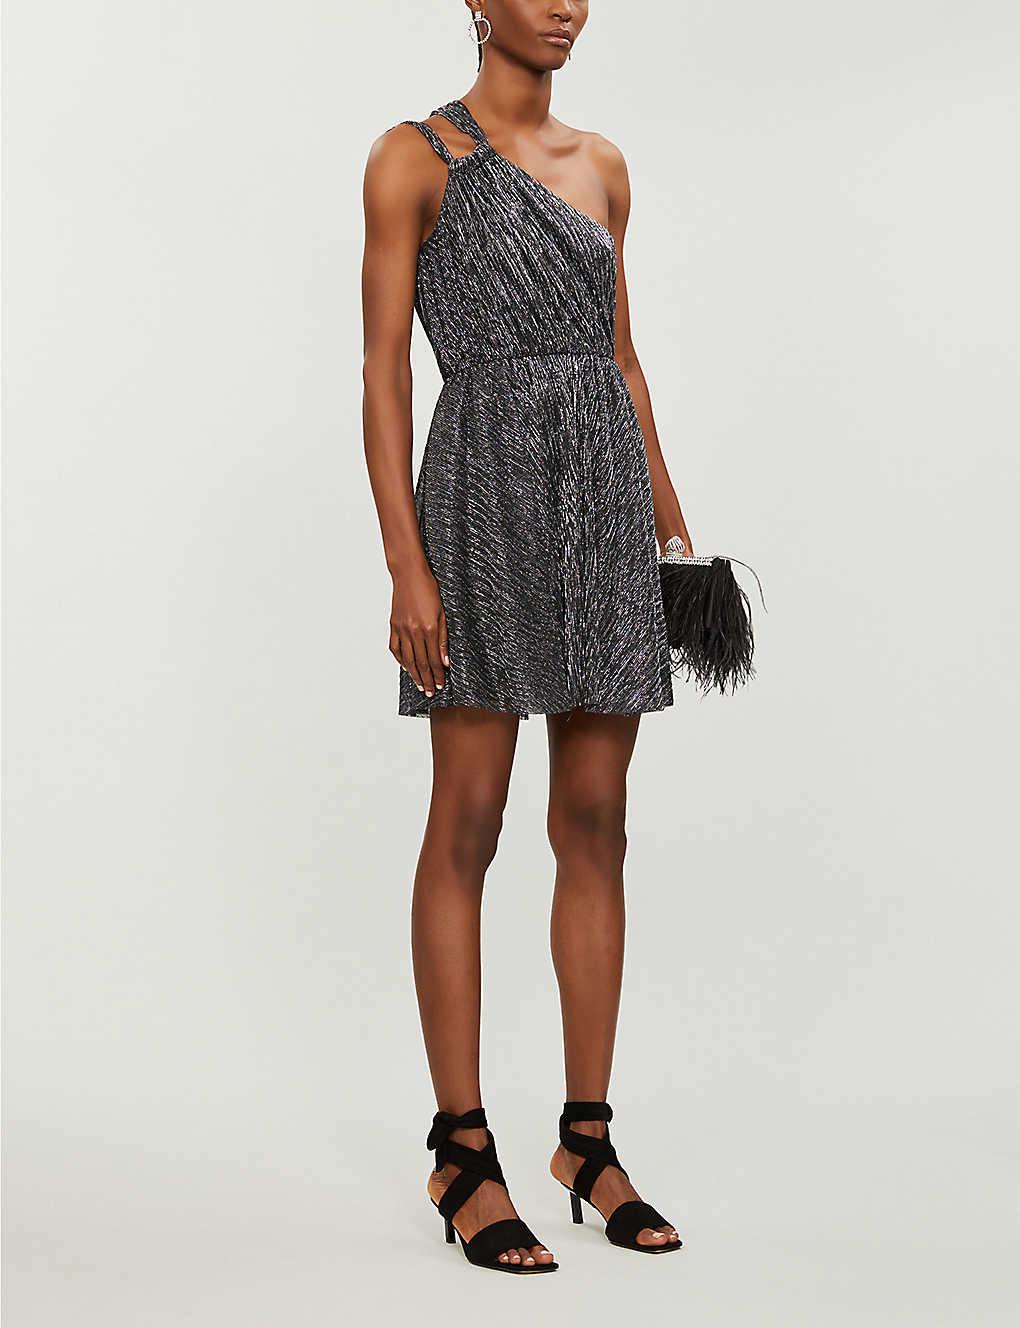 MAJE Riane Metallic Mini Dress